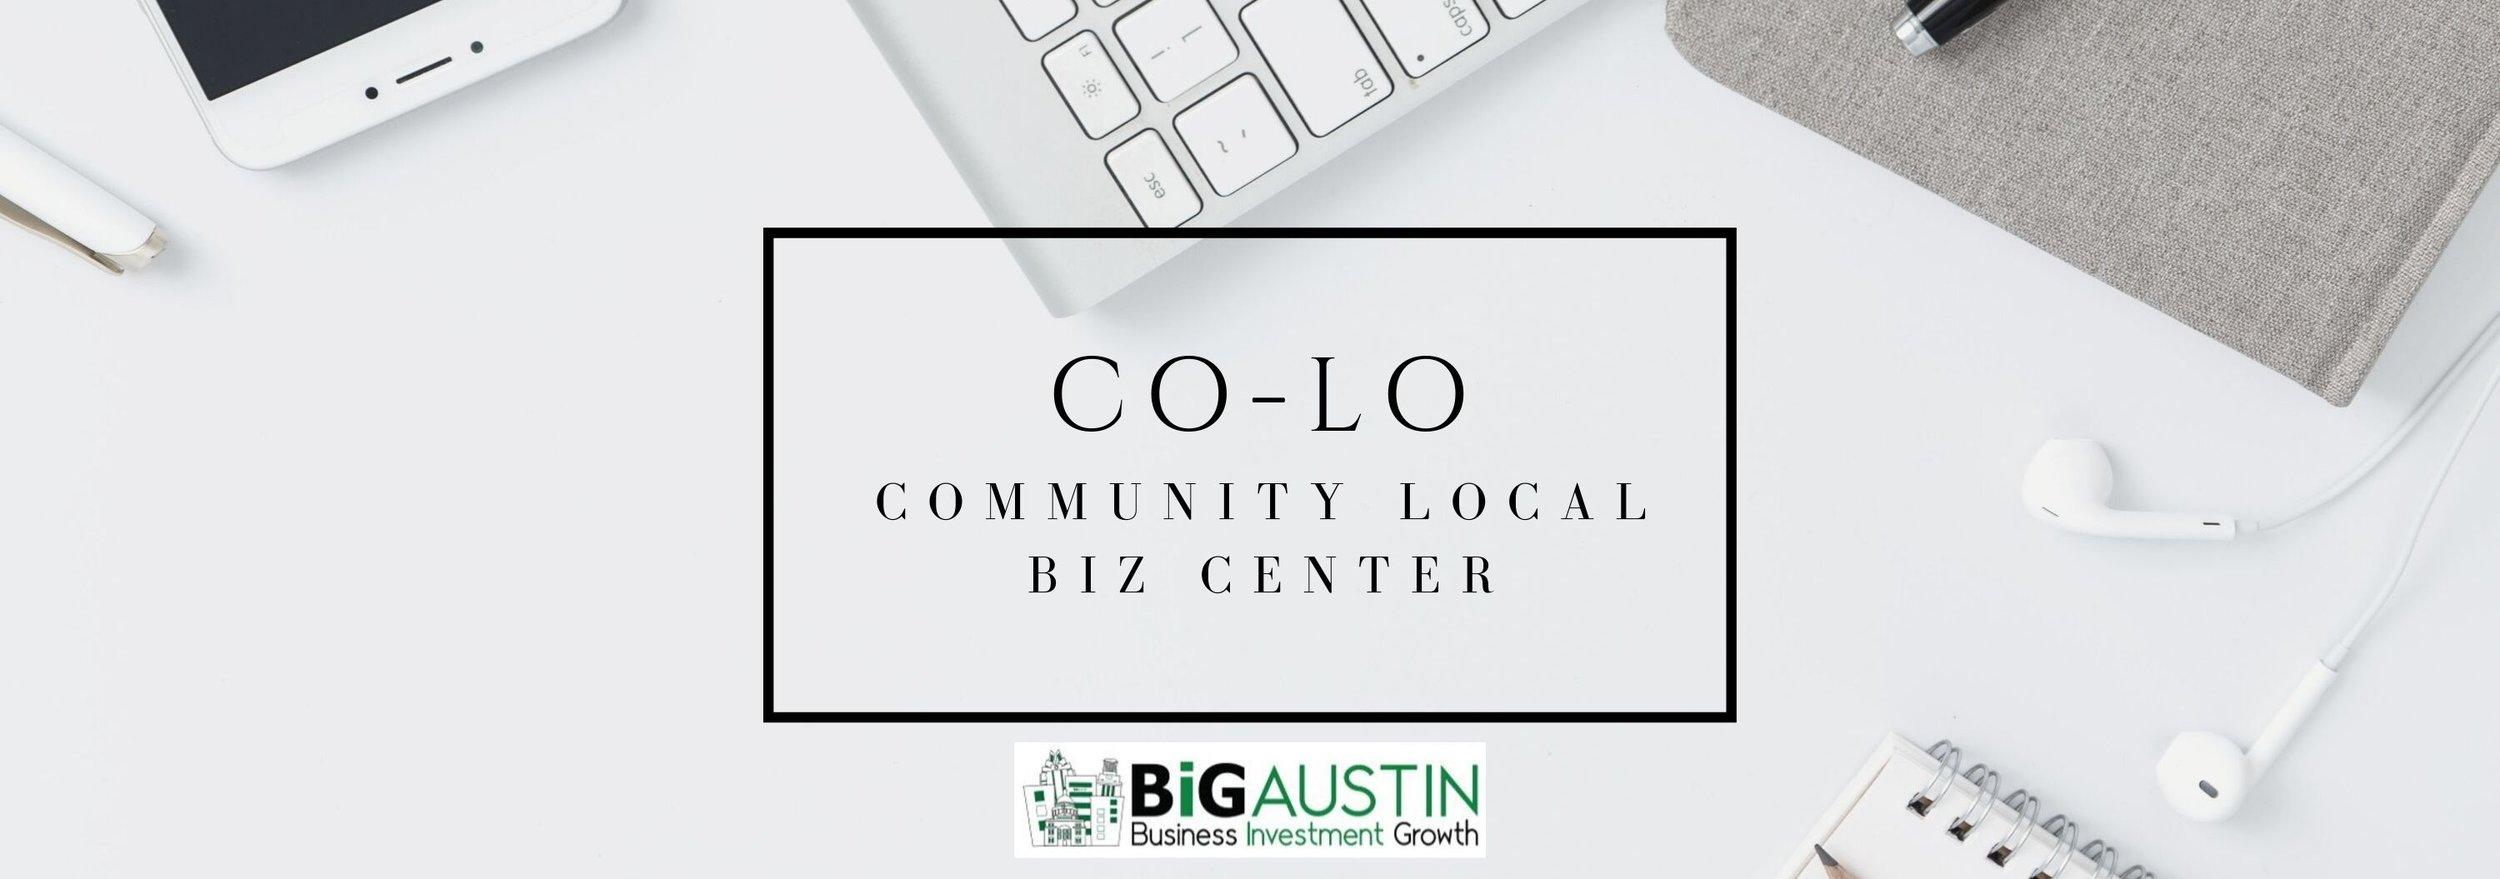 COLO webpage.jpg